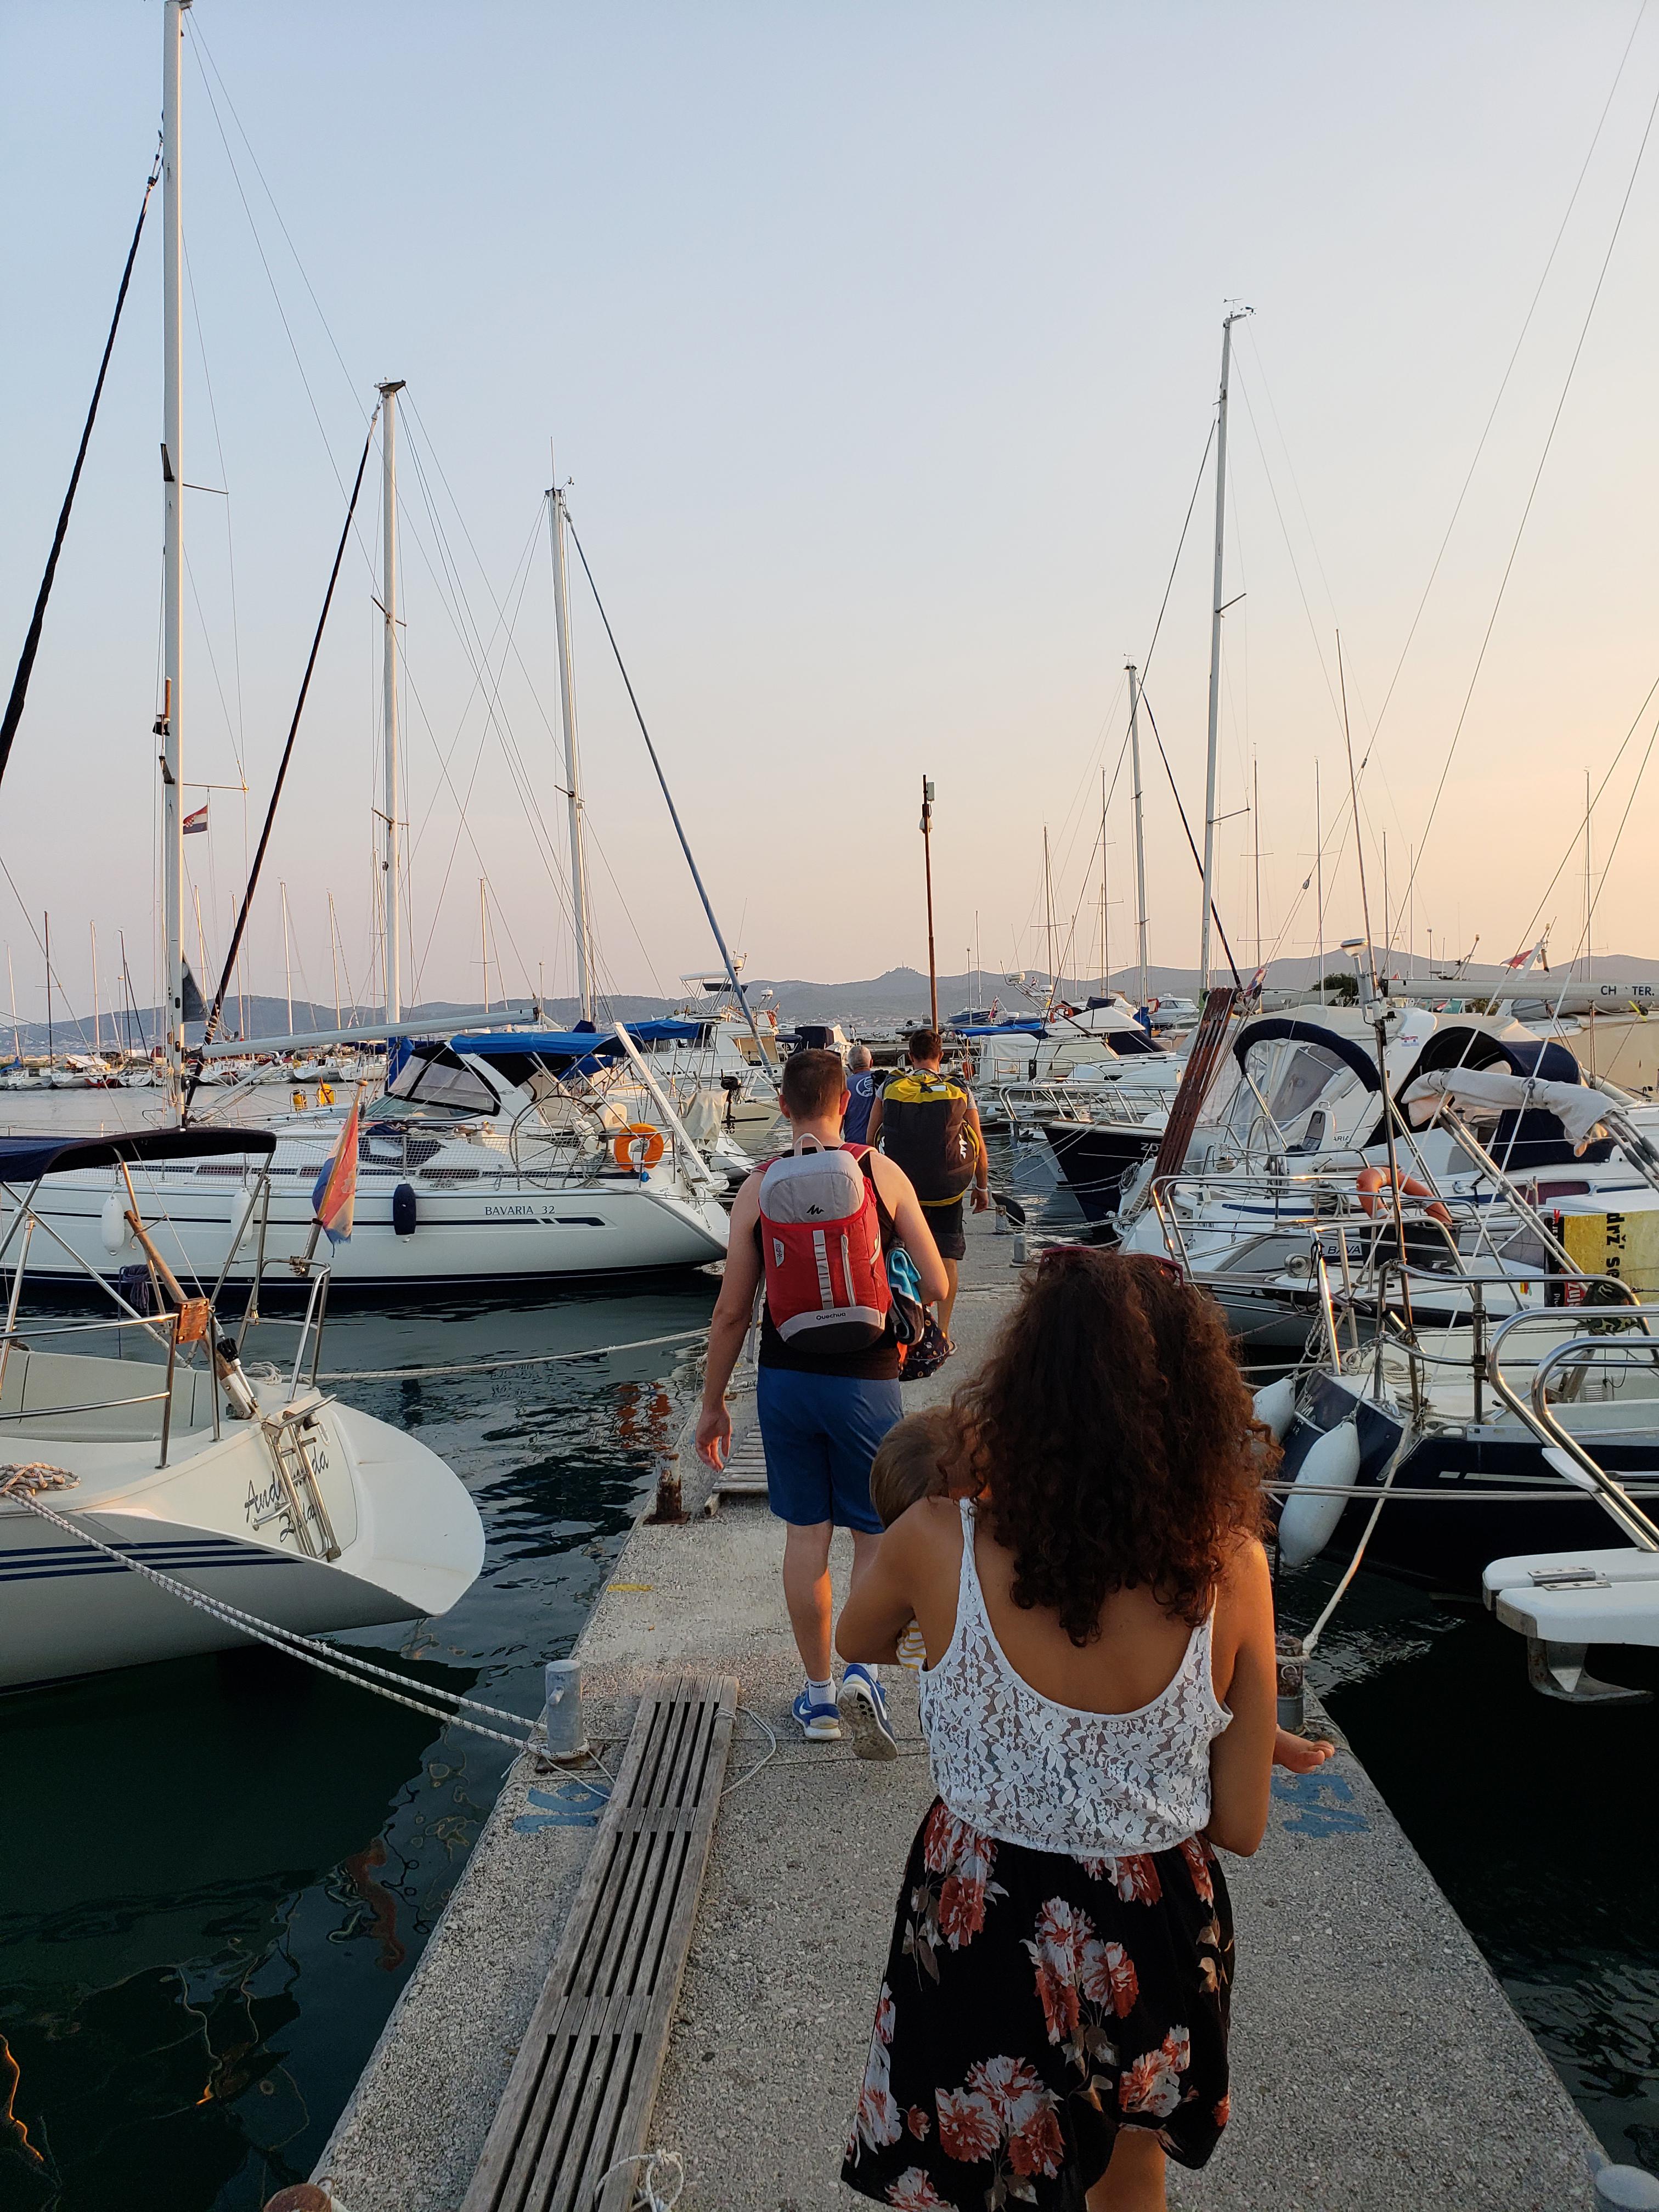 A_Complete_City_Guide_to_Zadar_Croatia